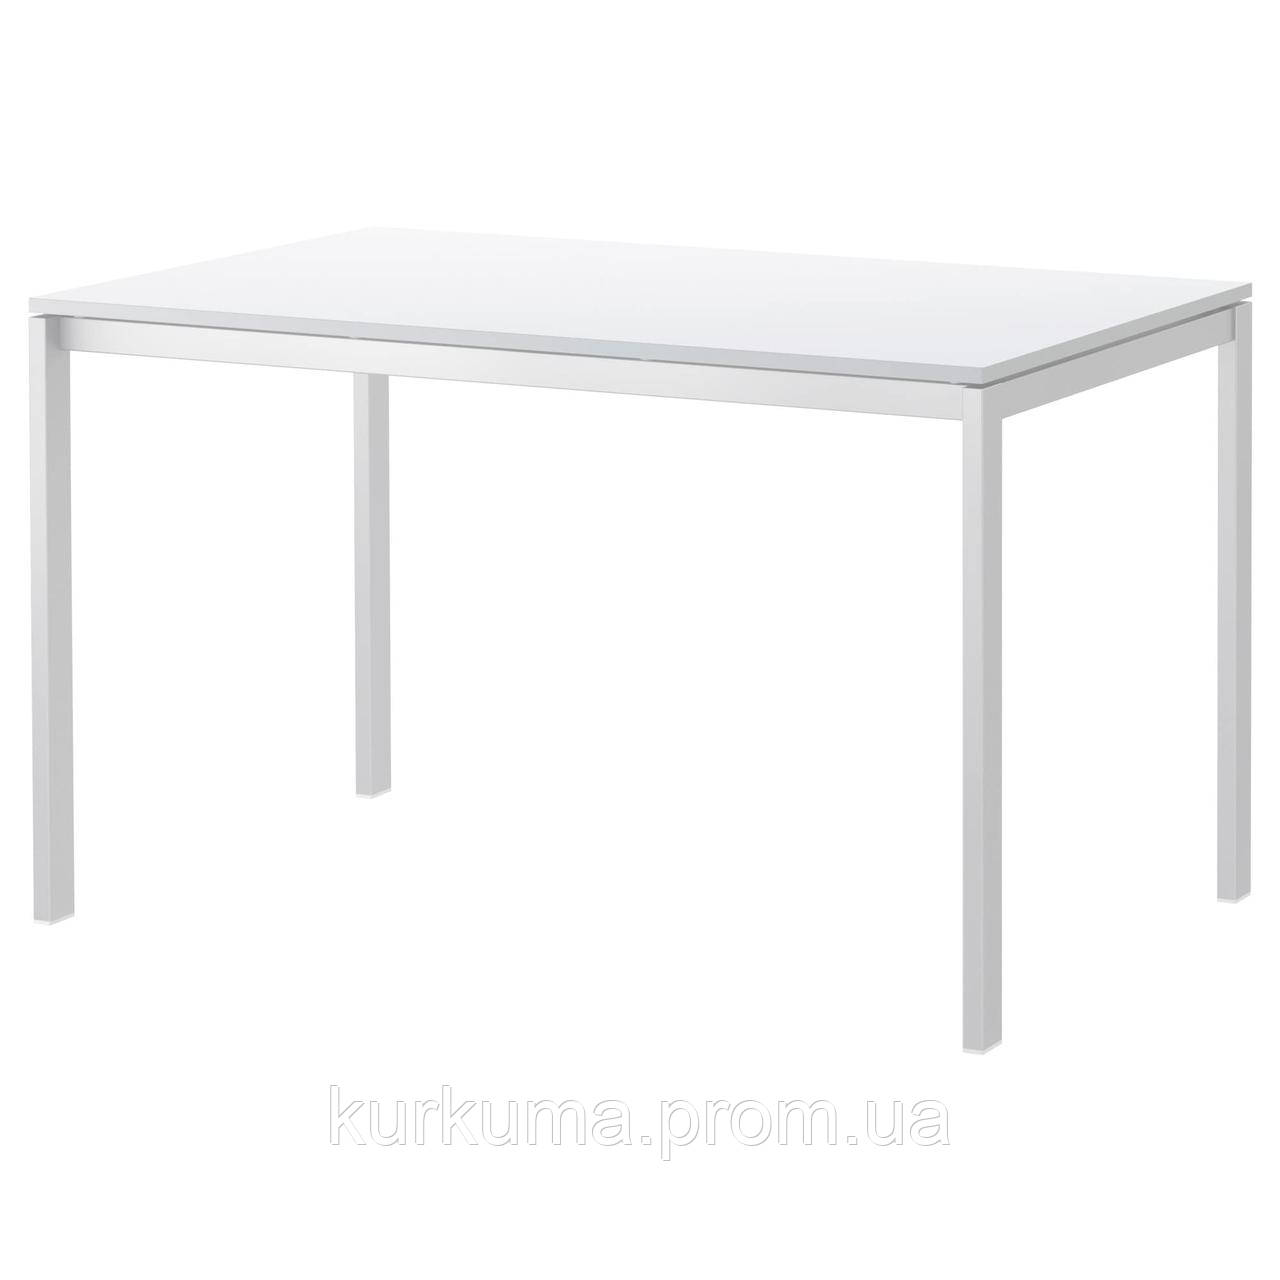 IKEA MELLTORP Стол, белый  (190.117.77)